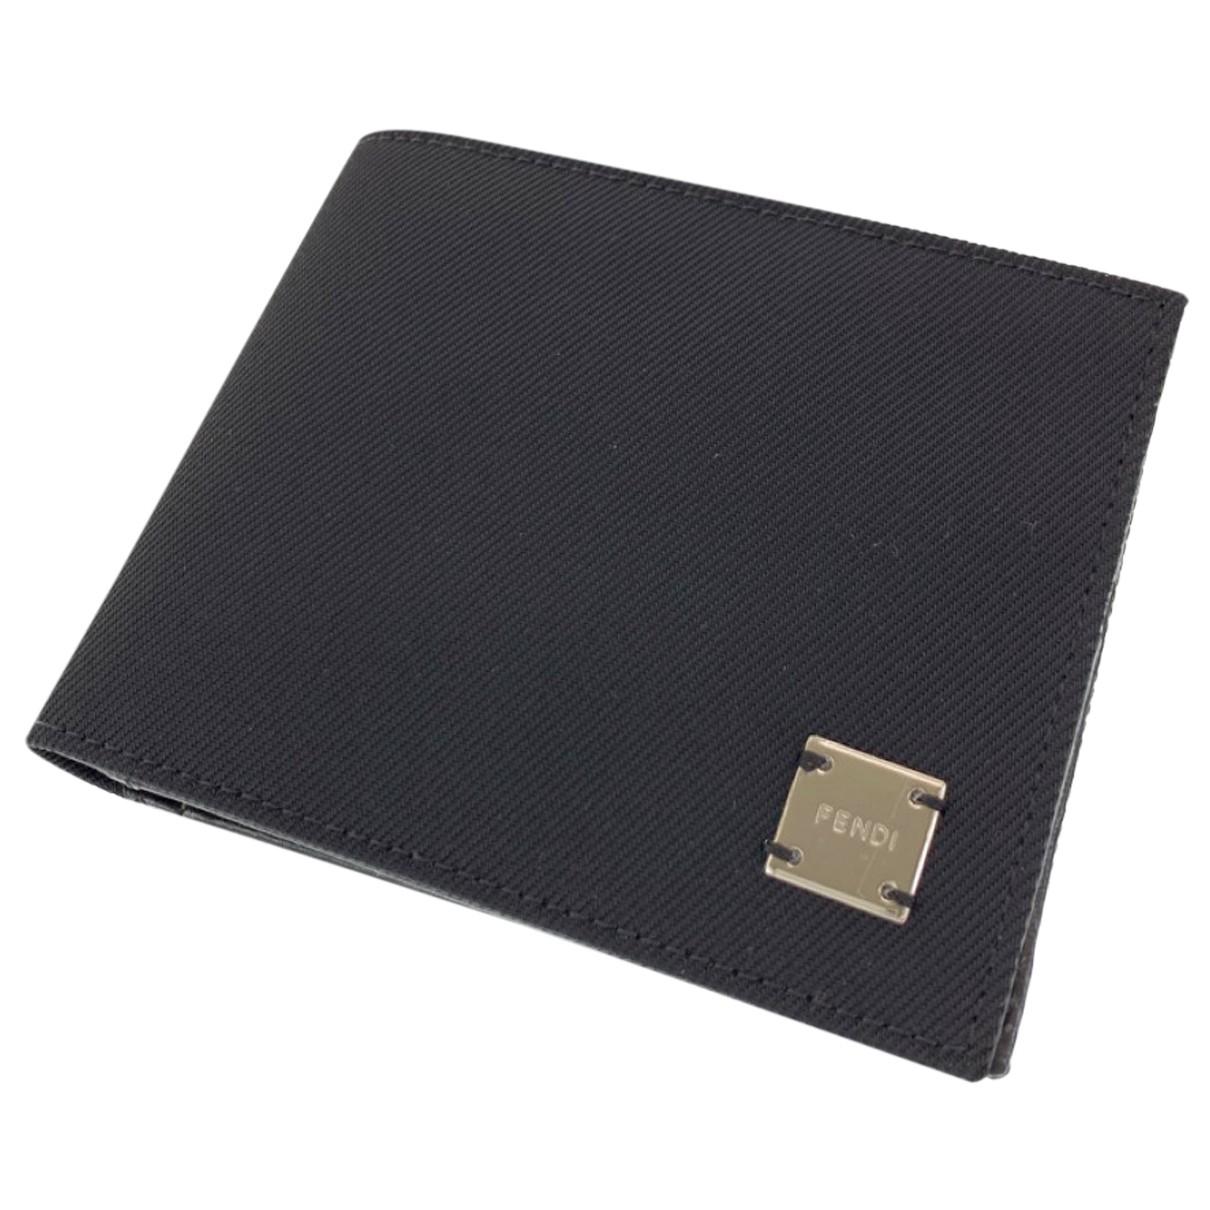 Fendi N wallet for Women N